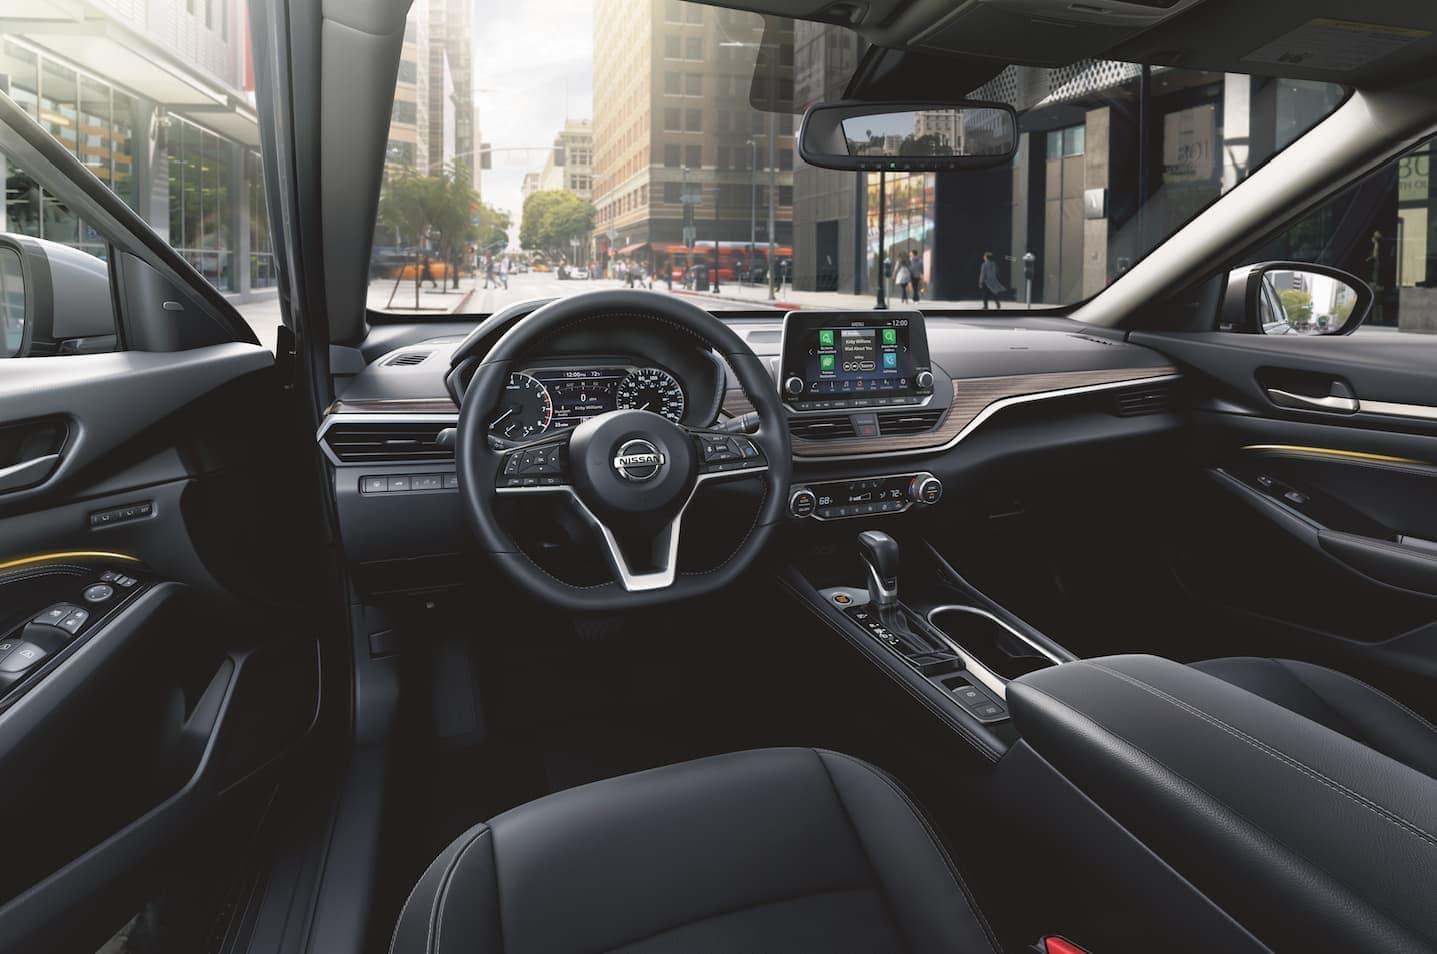 2021 Nissan Altima dashboard